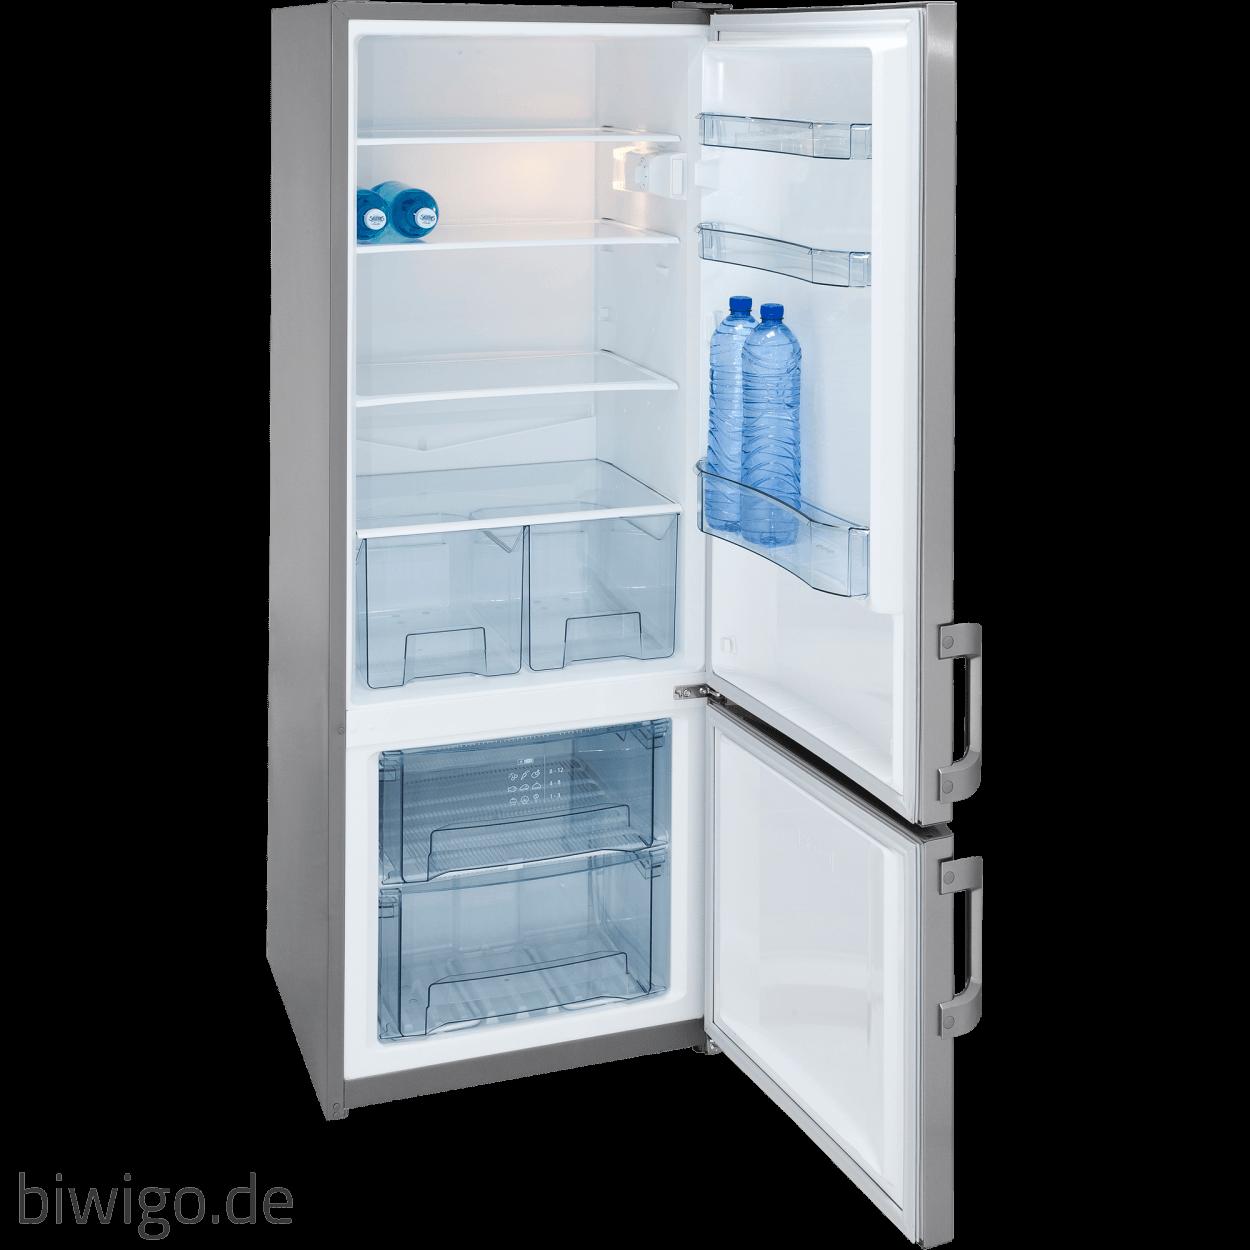 gorenje rk 61620 x kombinovana lednice. Black Bedroom Furniture Sets. Home Design Ideas